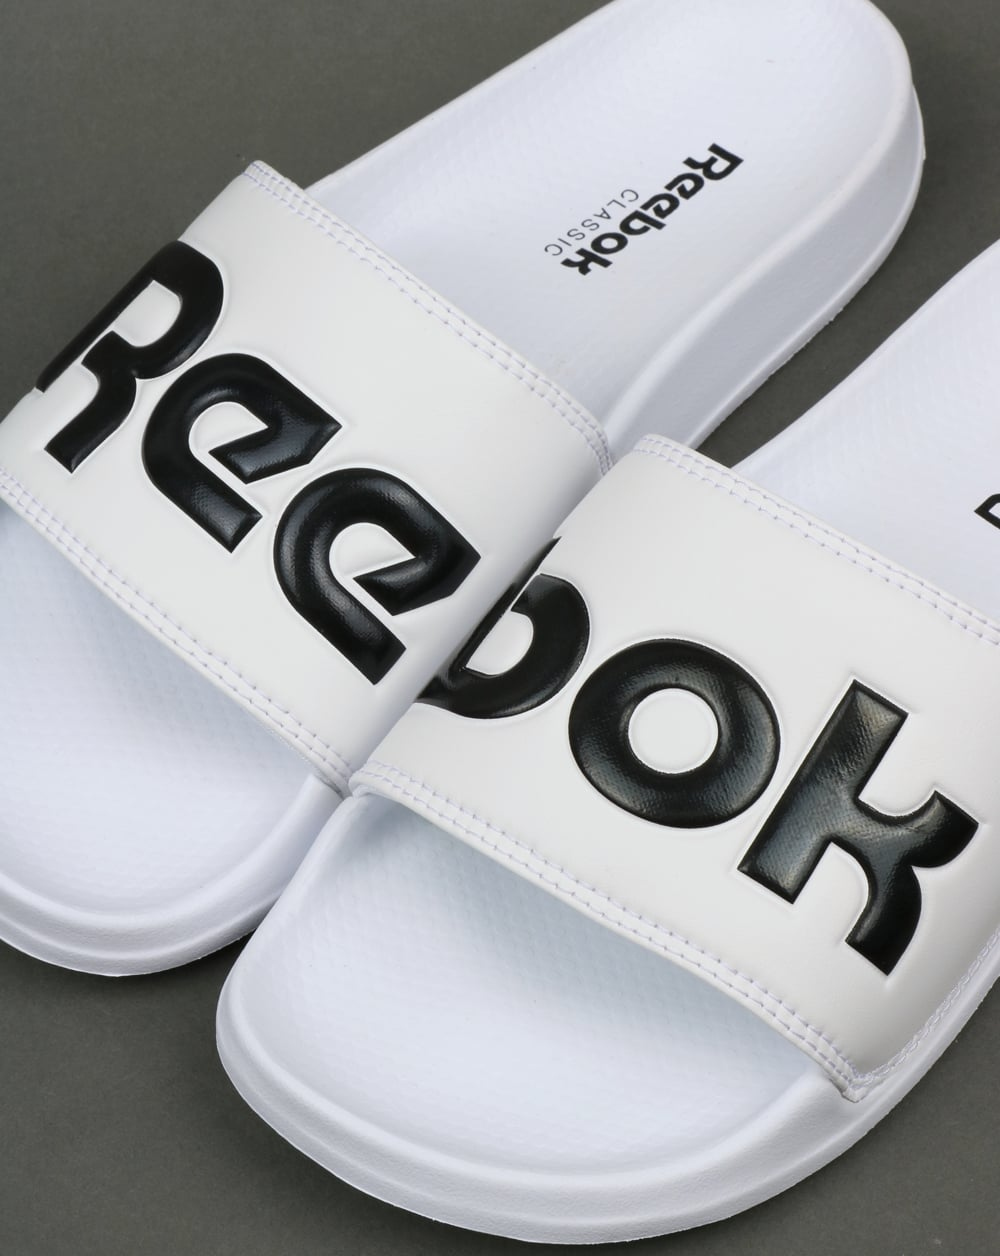 655a2a5489f36d Reebok Classic Logo Sliders White